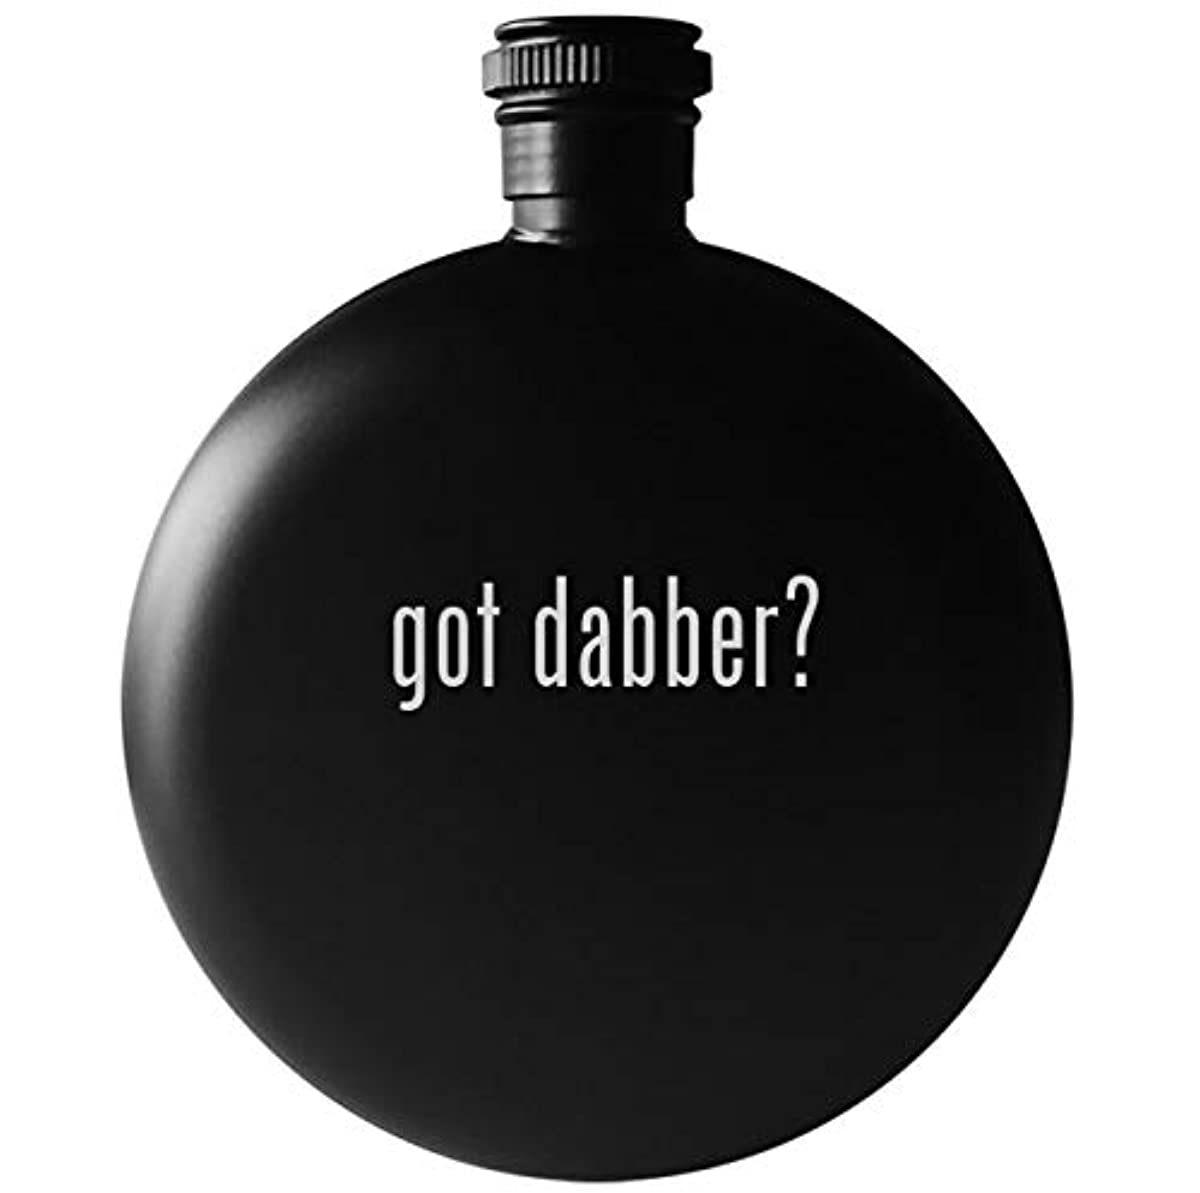 got dabber? - 5oz Round Drinking Alcohol Flask, Matte Black